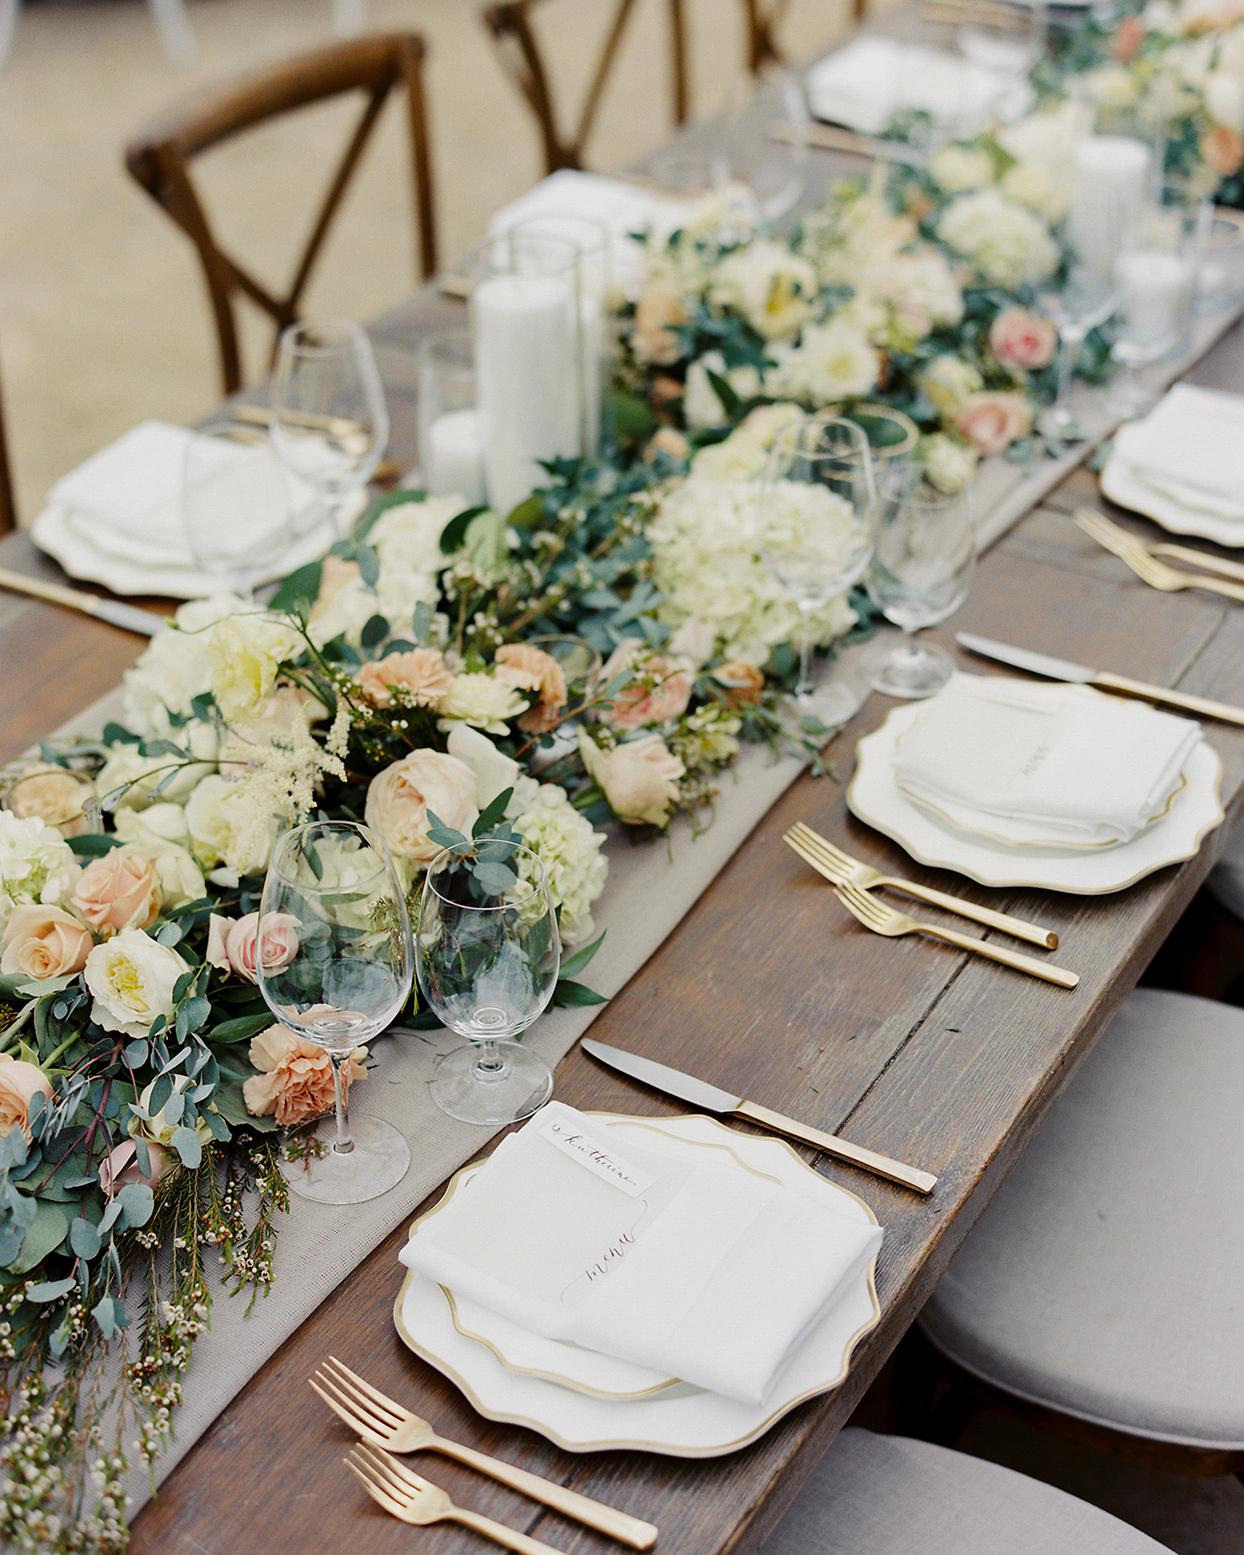 mika steve wedding garland centerpiece on rustic table